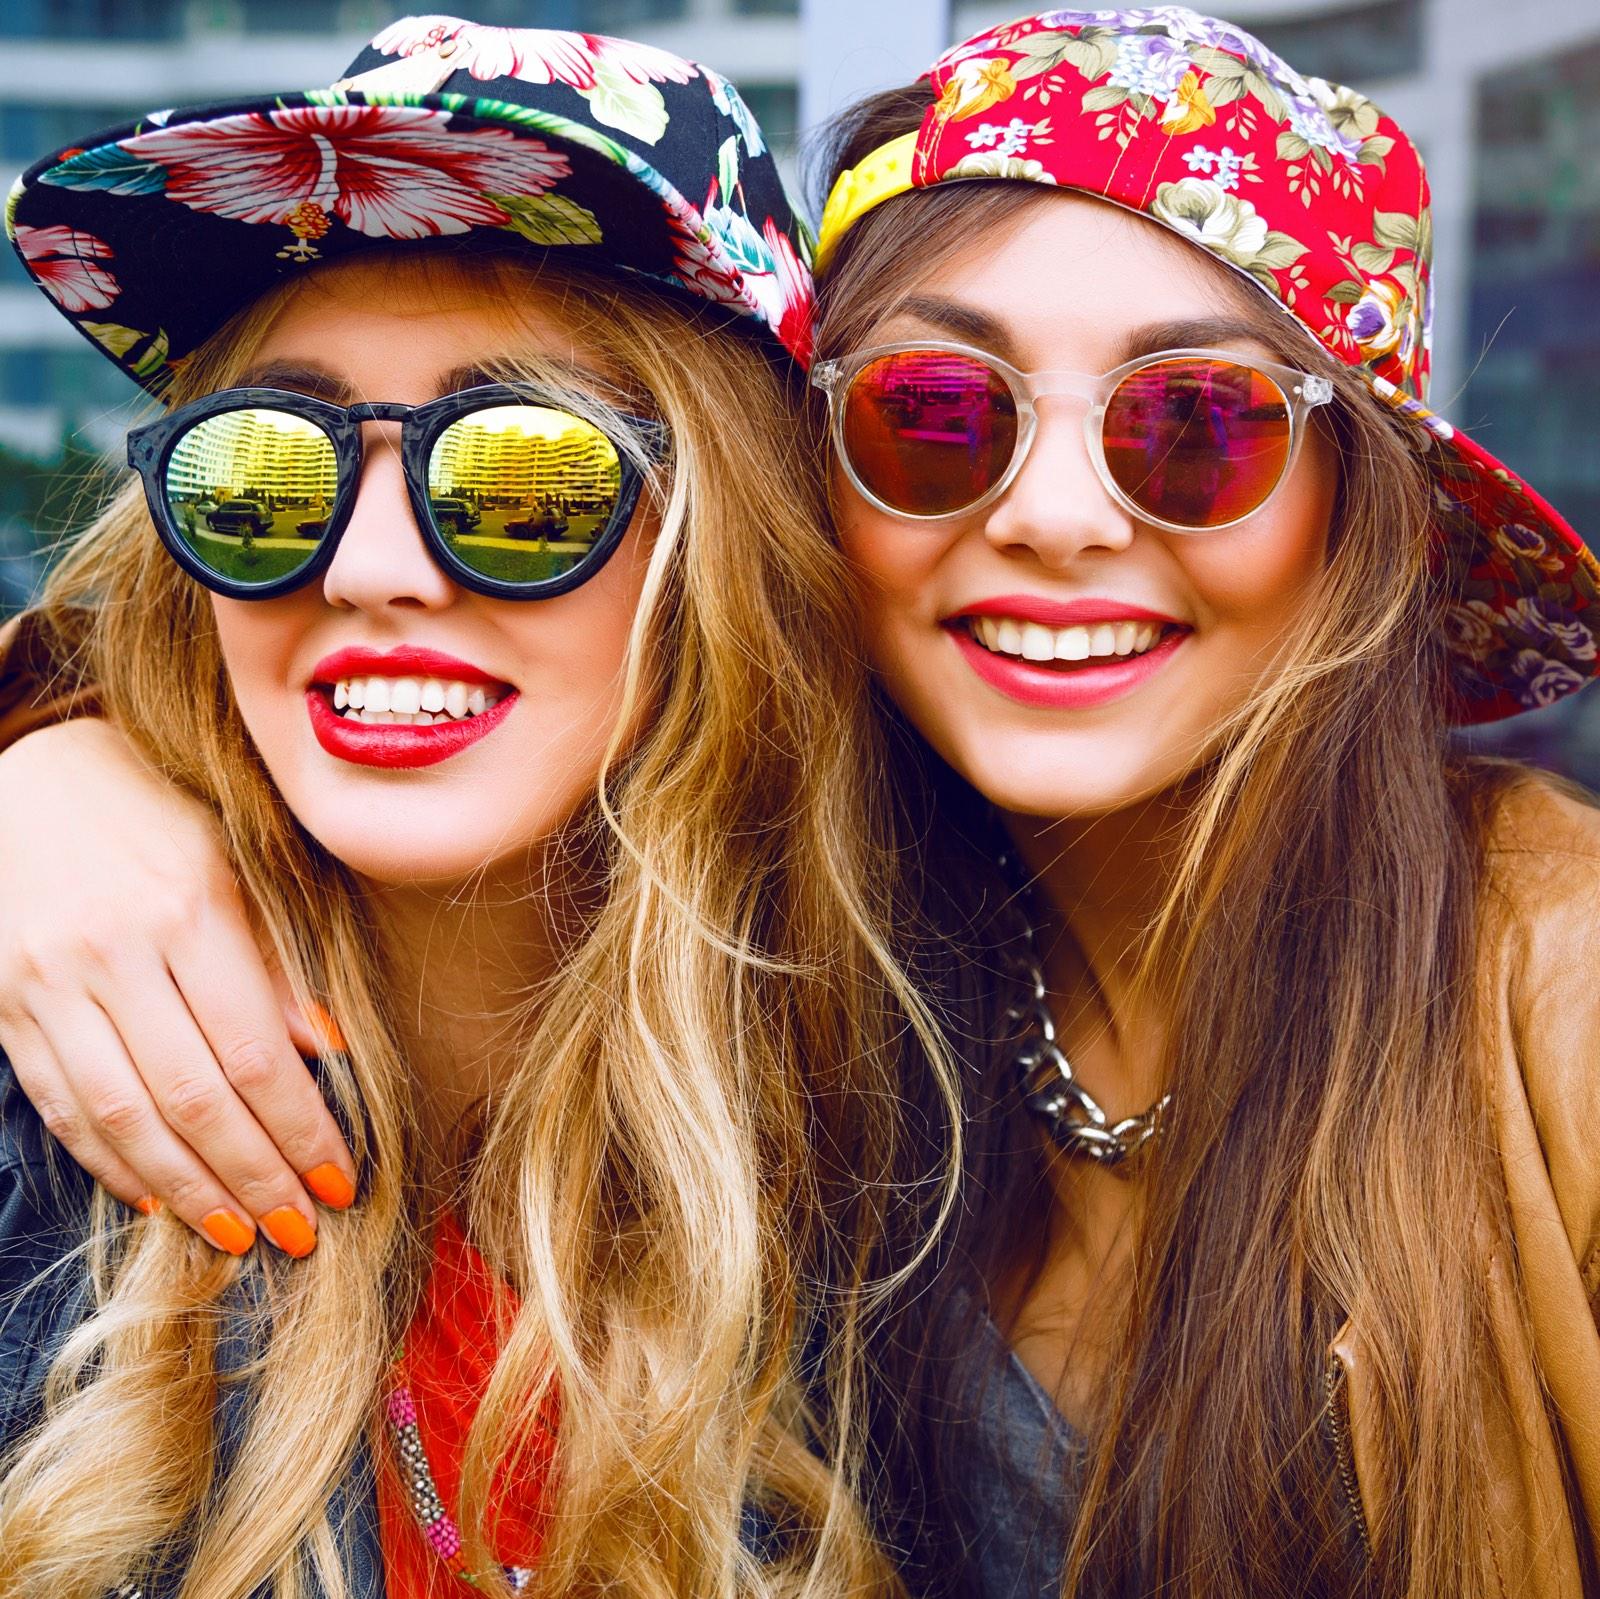 twee meisjes me zonnebrillen en hoedjes